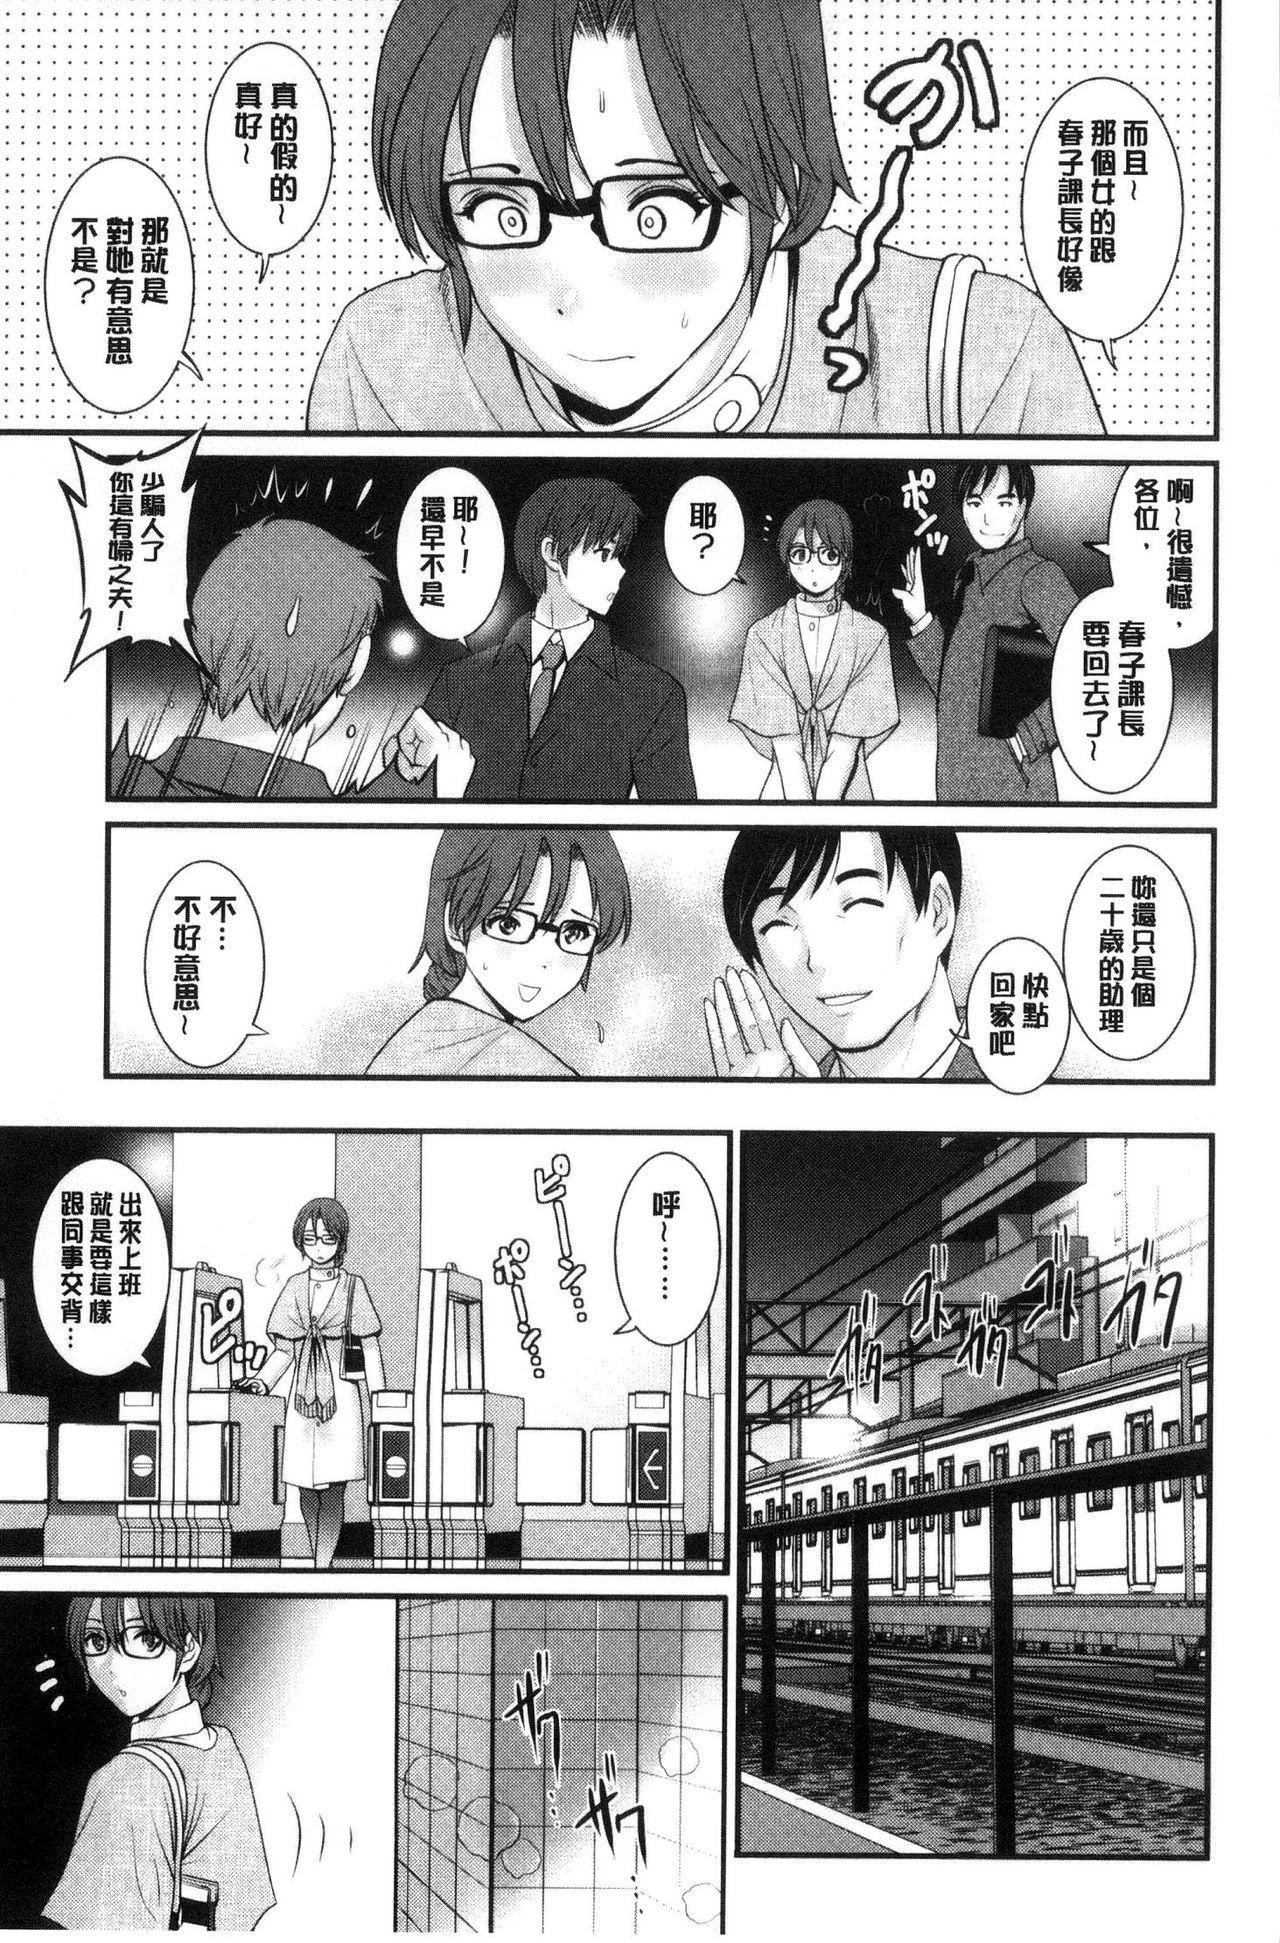 Toshimaku Sodachi no Toshima-san   年增區孕育的豐島小姐 43